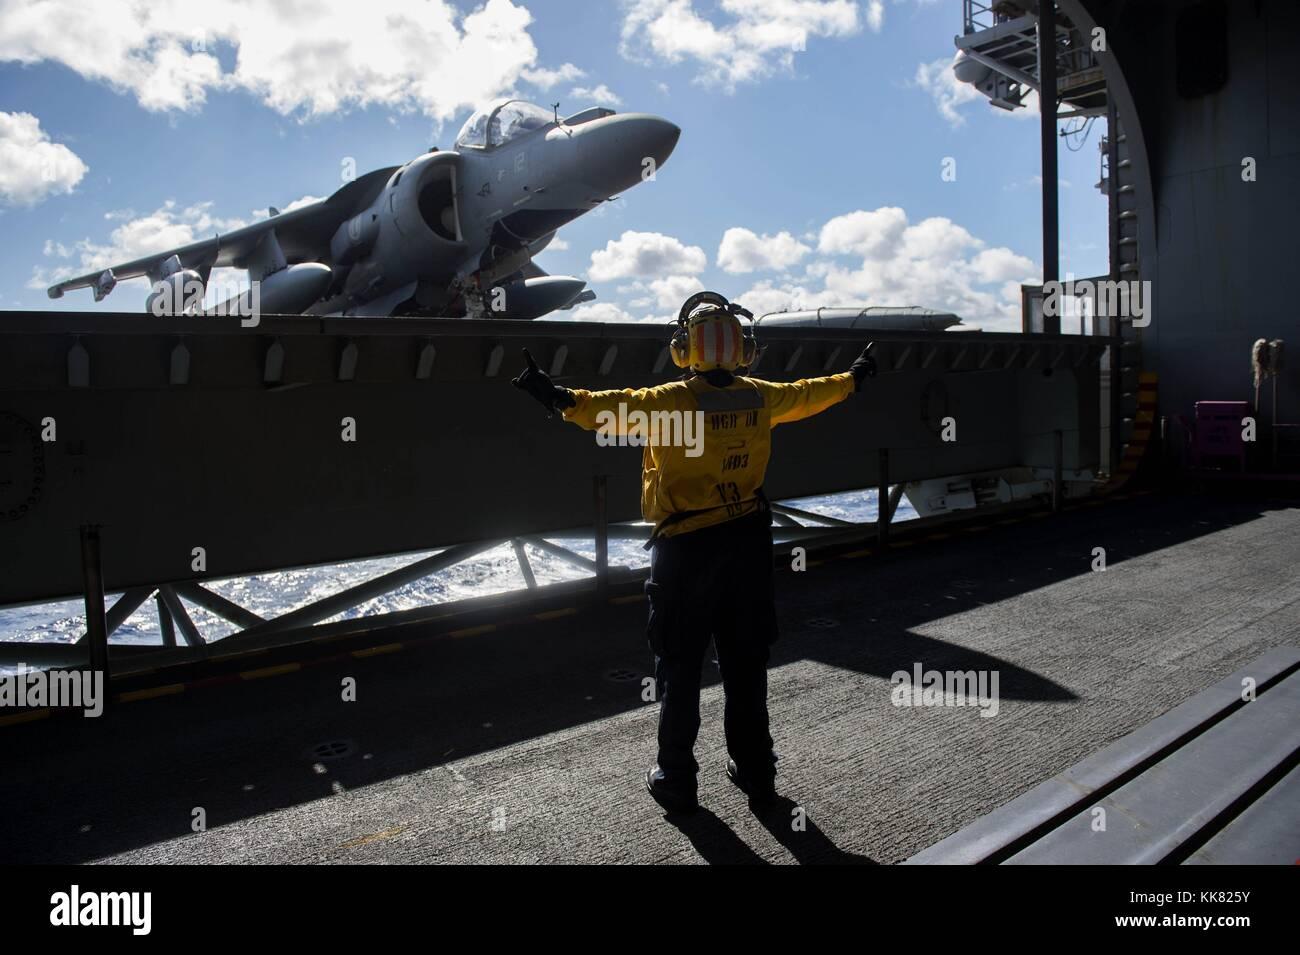 Aviation Boatswain's Mate Handling 2nd Class Araminta Mack directs an elevator operator in the hangar bay of - Stock Image